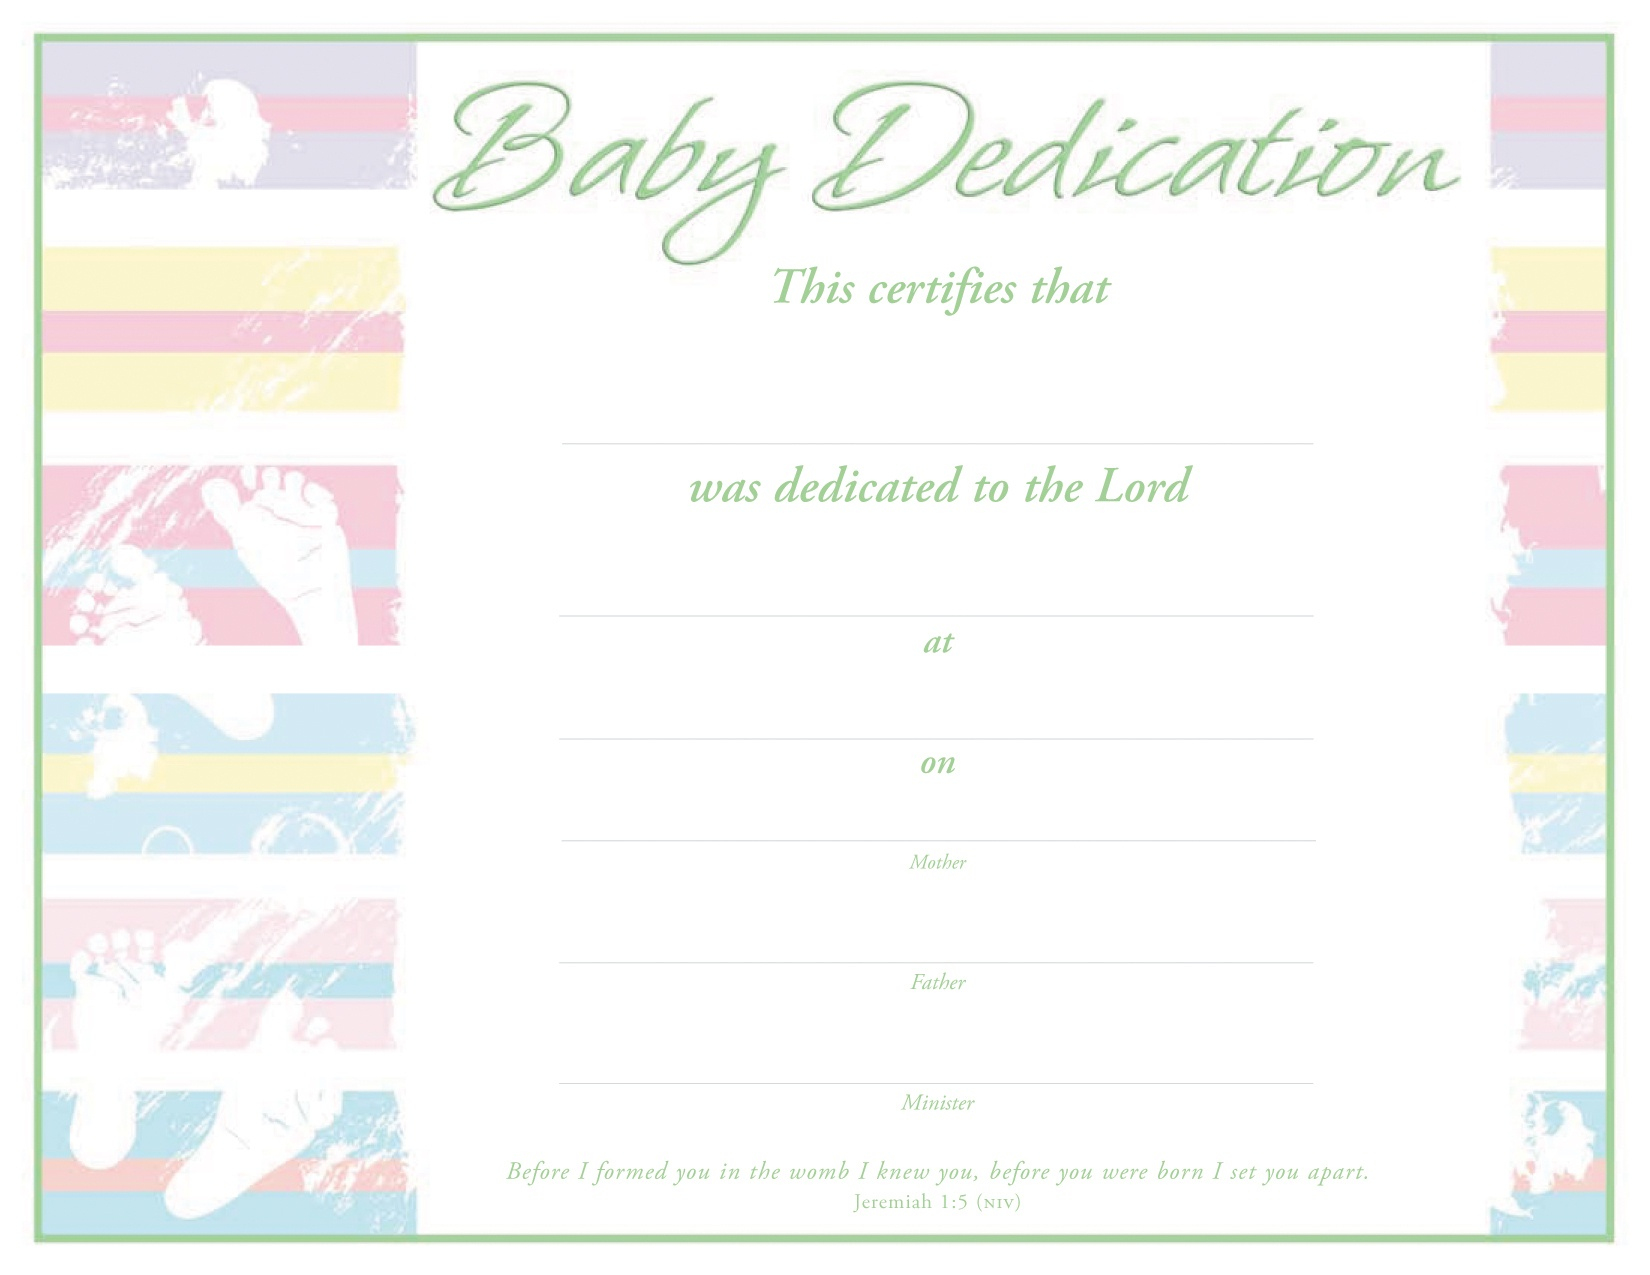 Baby Dedication Certificate - Certificate - Dedication - Christian - Free Baby Dedication Certificate Printable